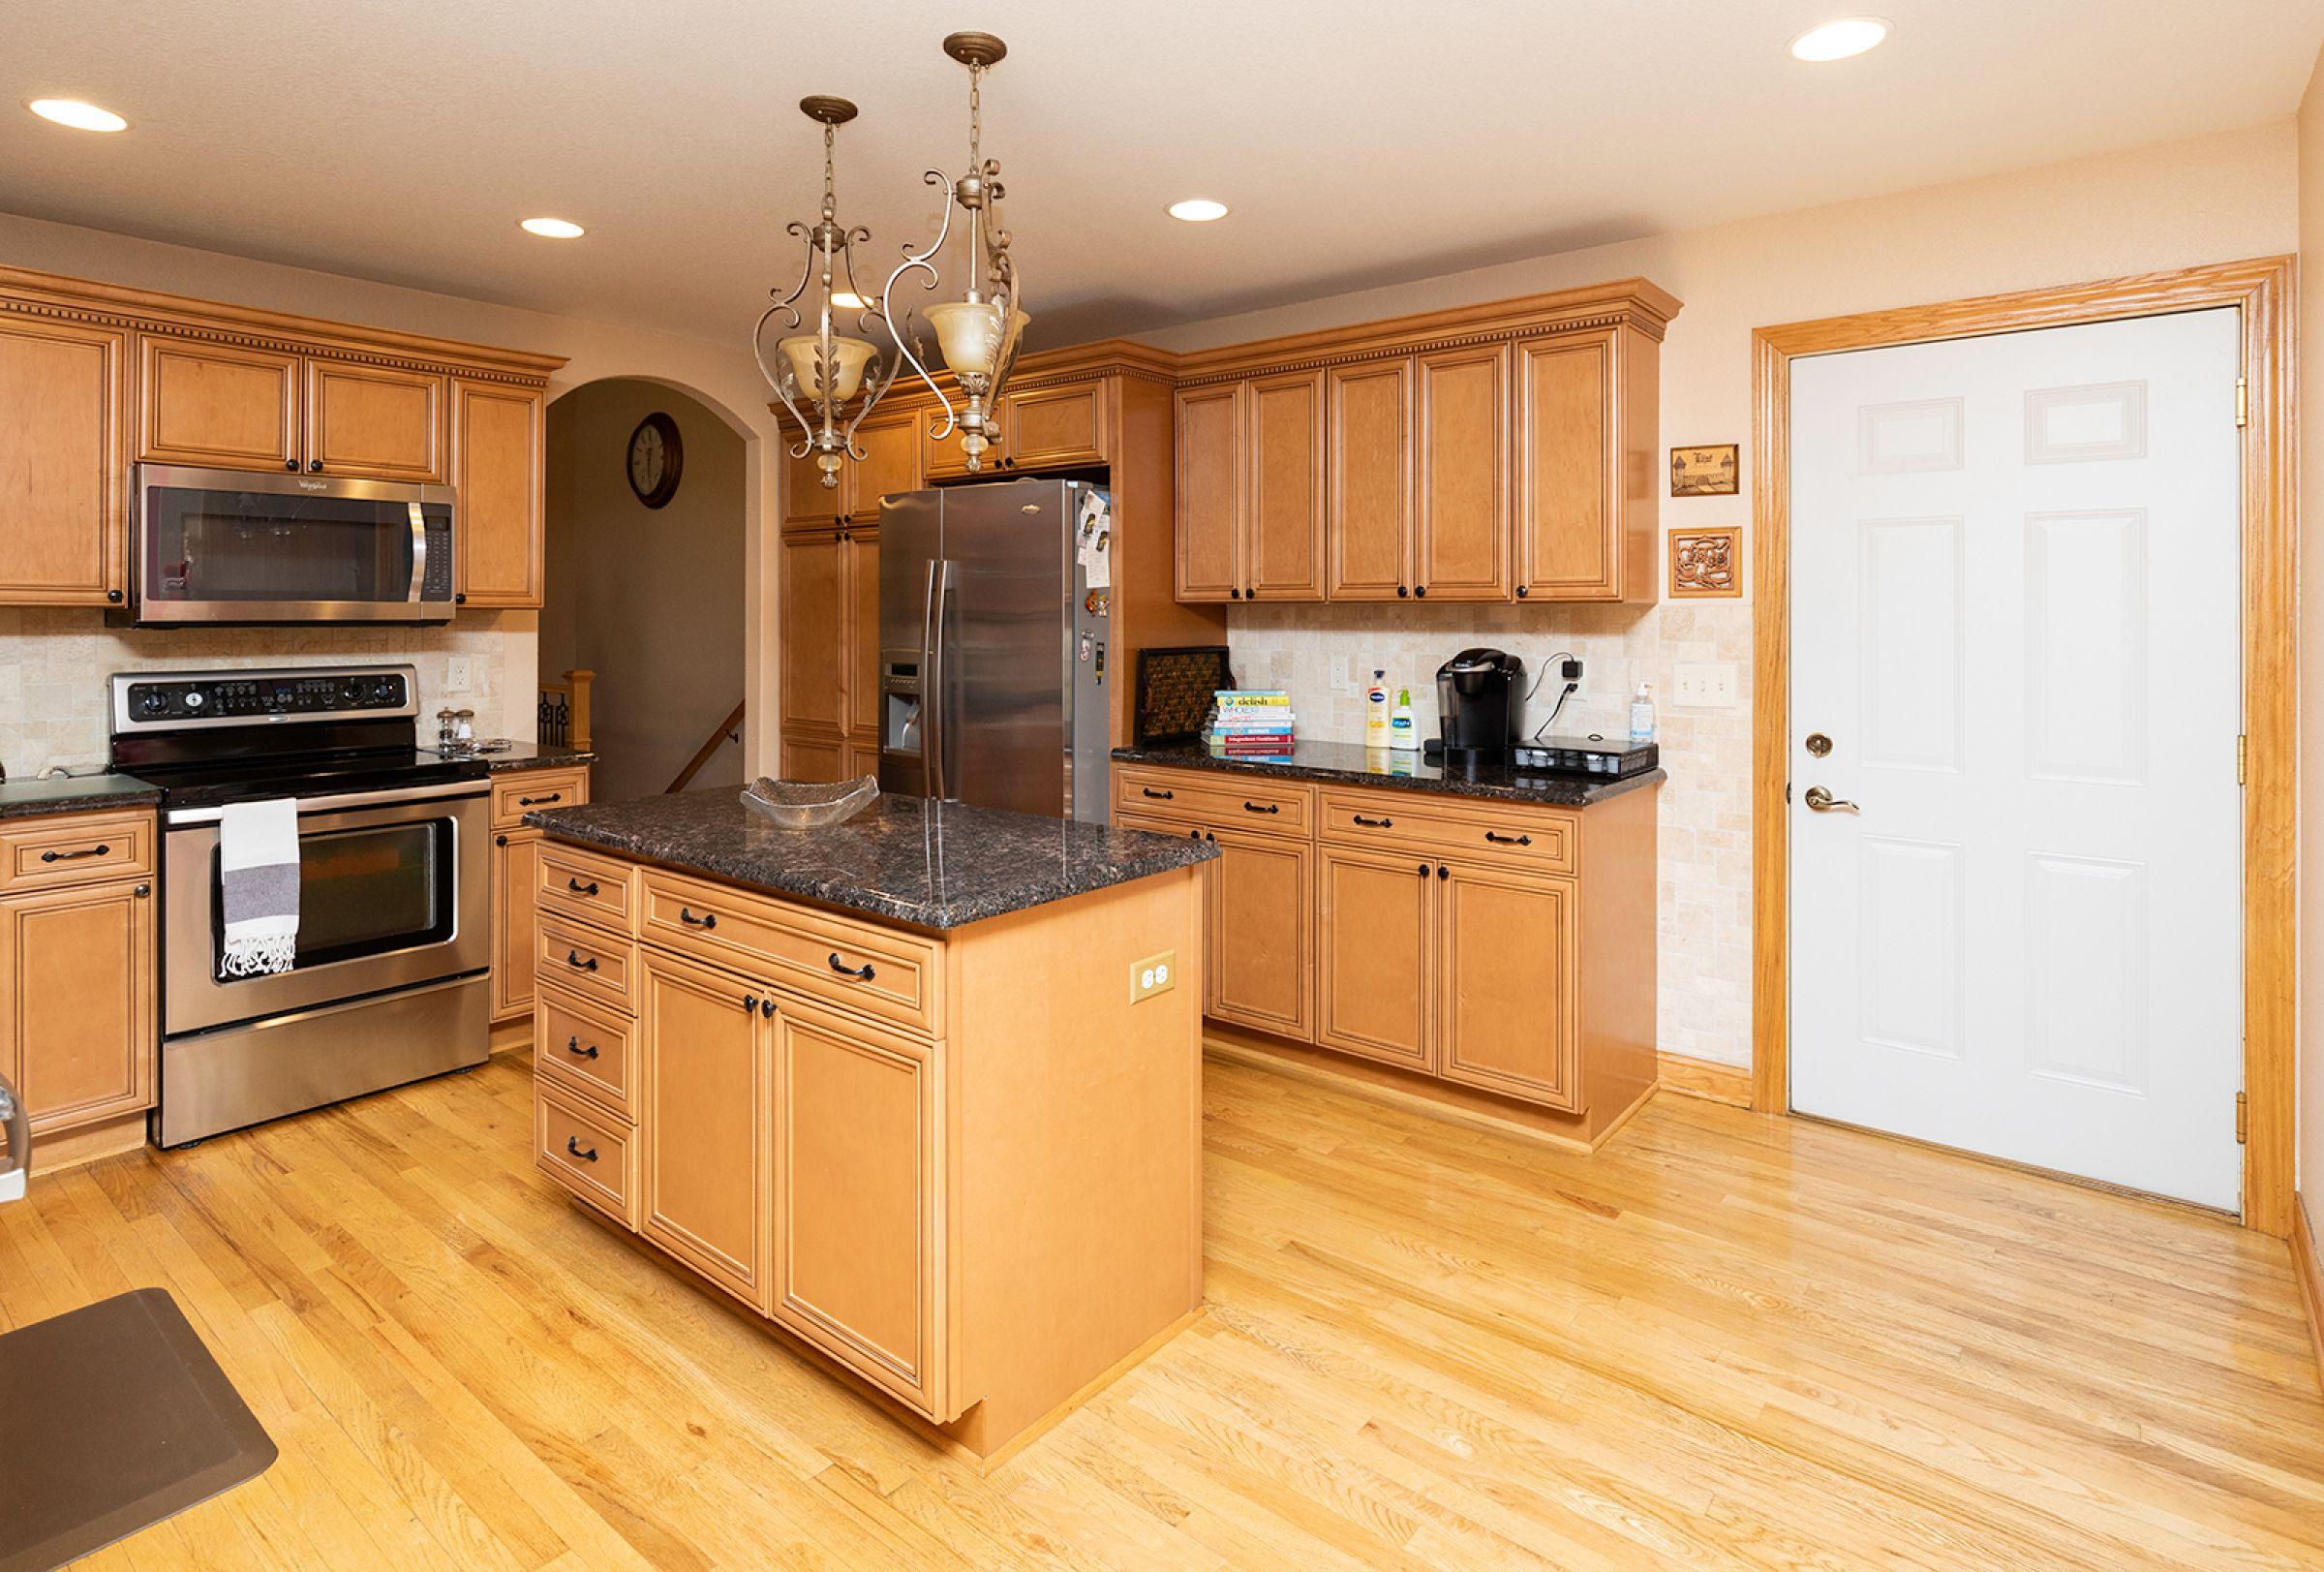 residential-polk-county-iowa-0-acres-listing-number-15458-0-2021-04-11-140822.jpg